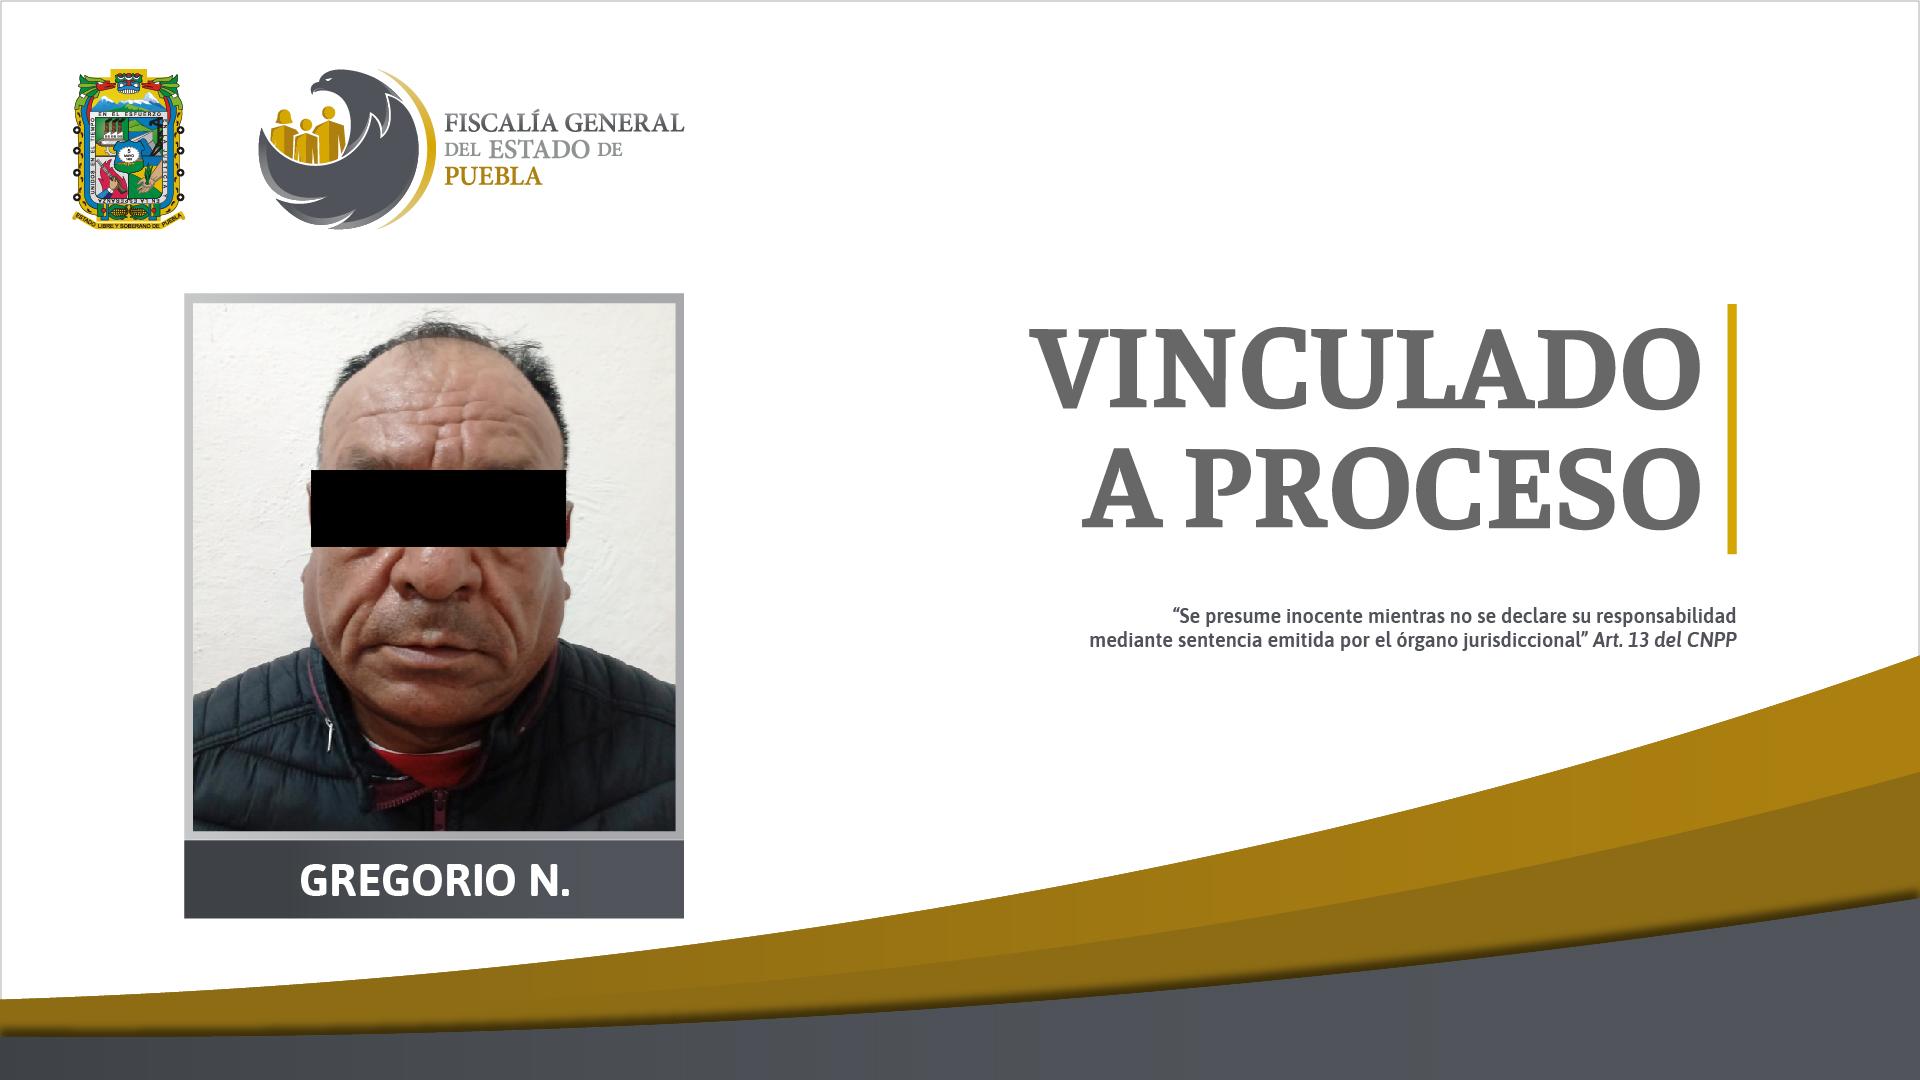 Gregorio N VaP fge